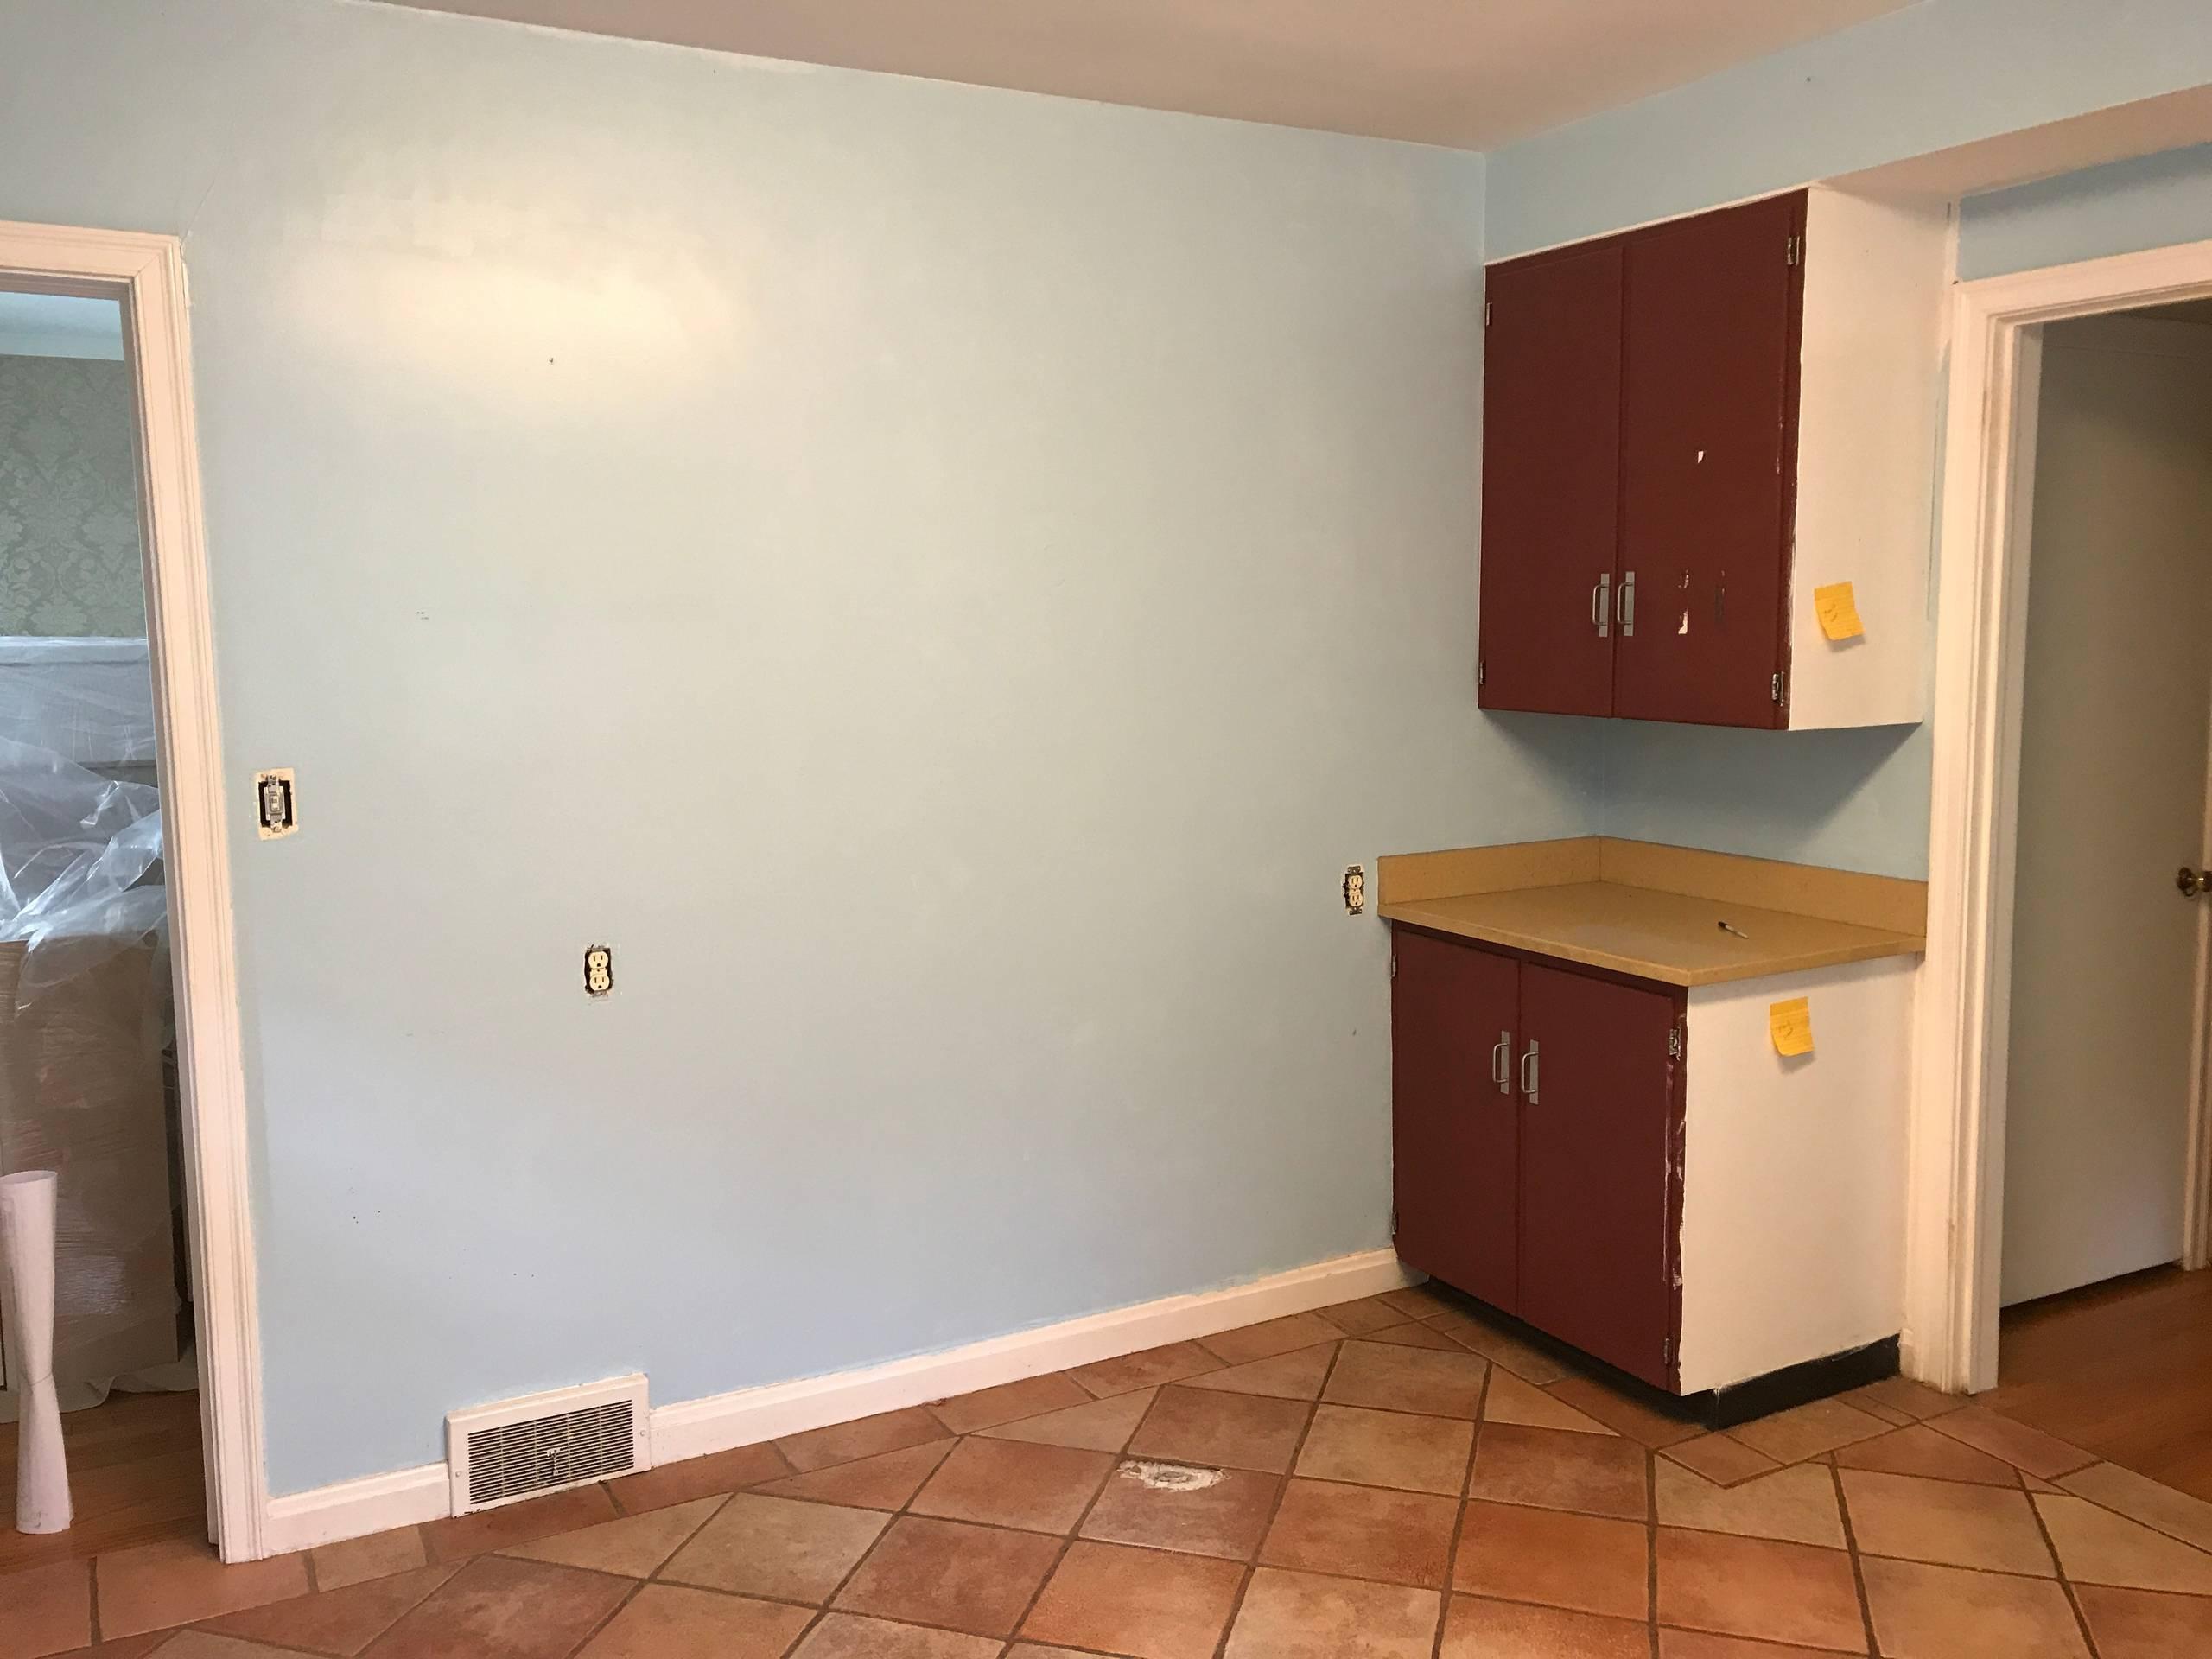 South Park Kitchen Remodel